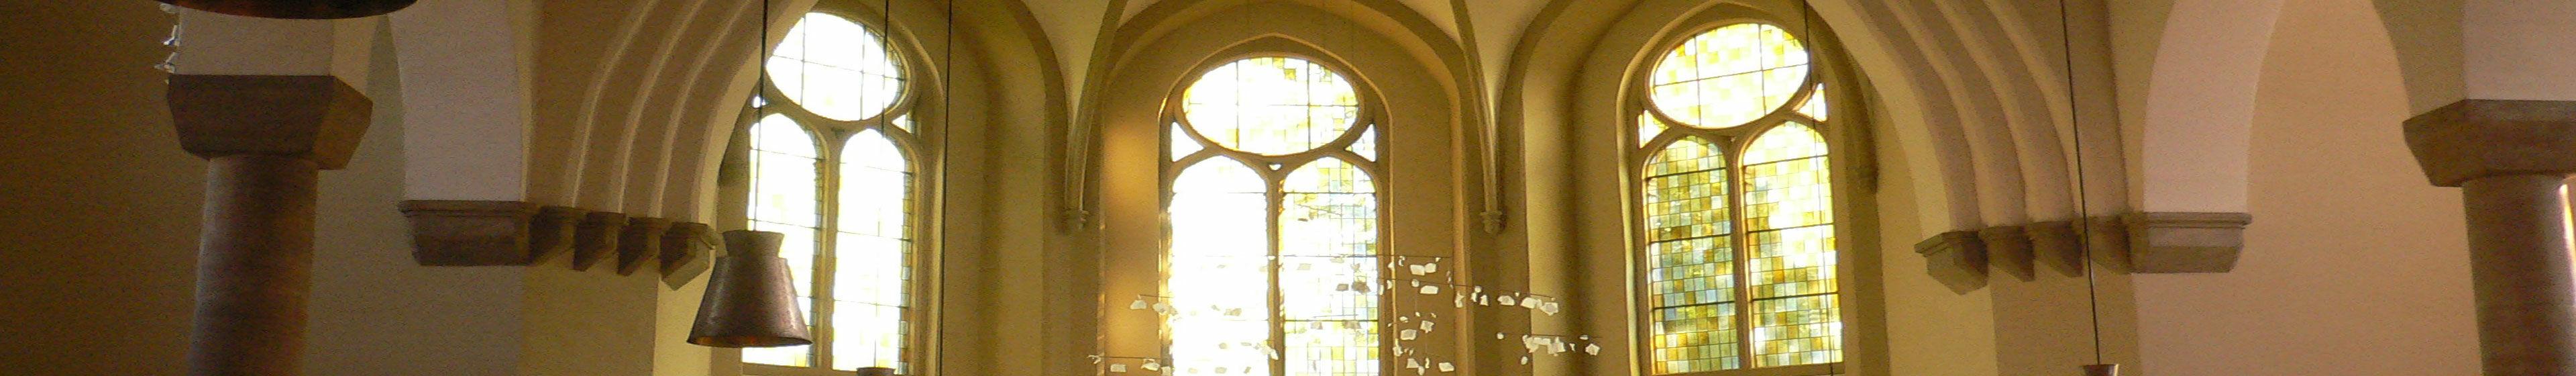 Fenster_Petri